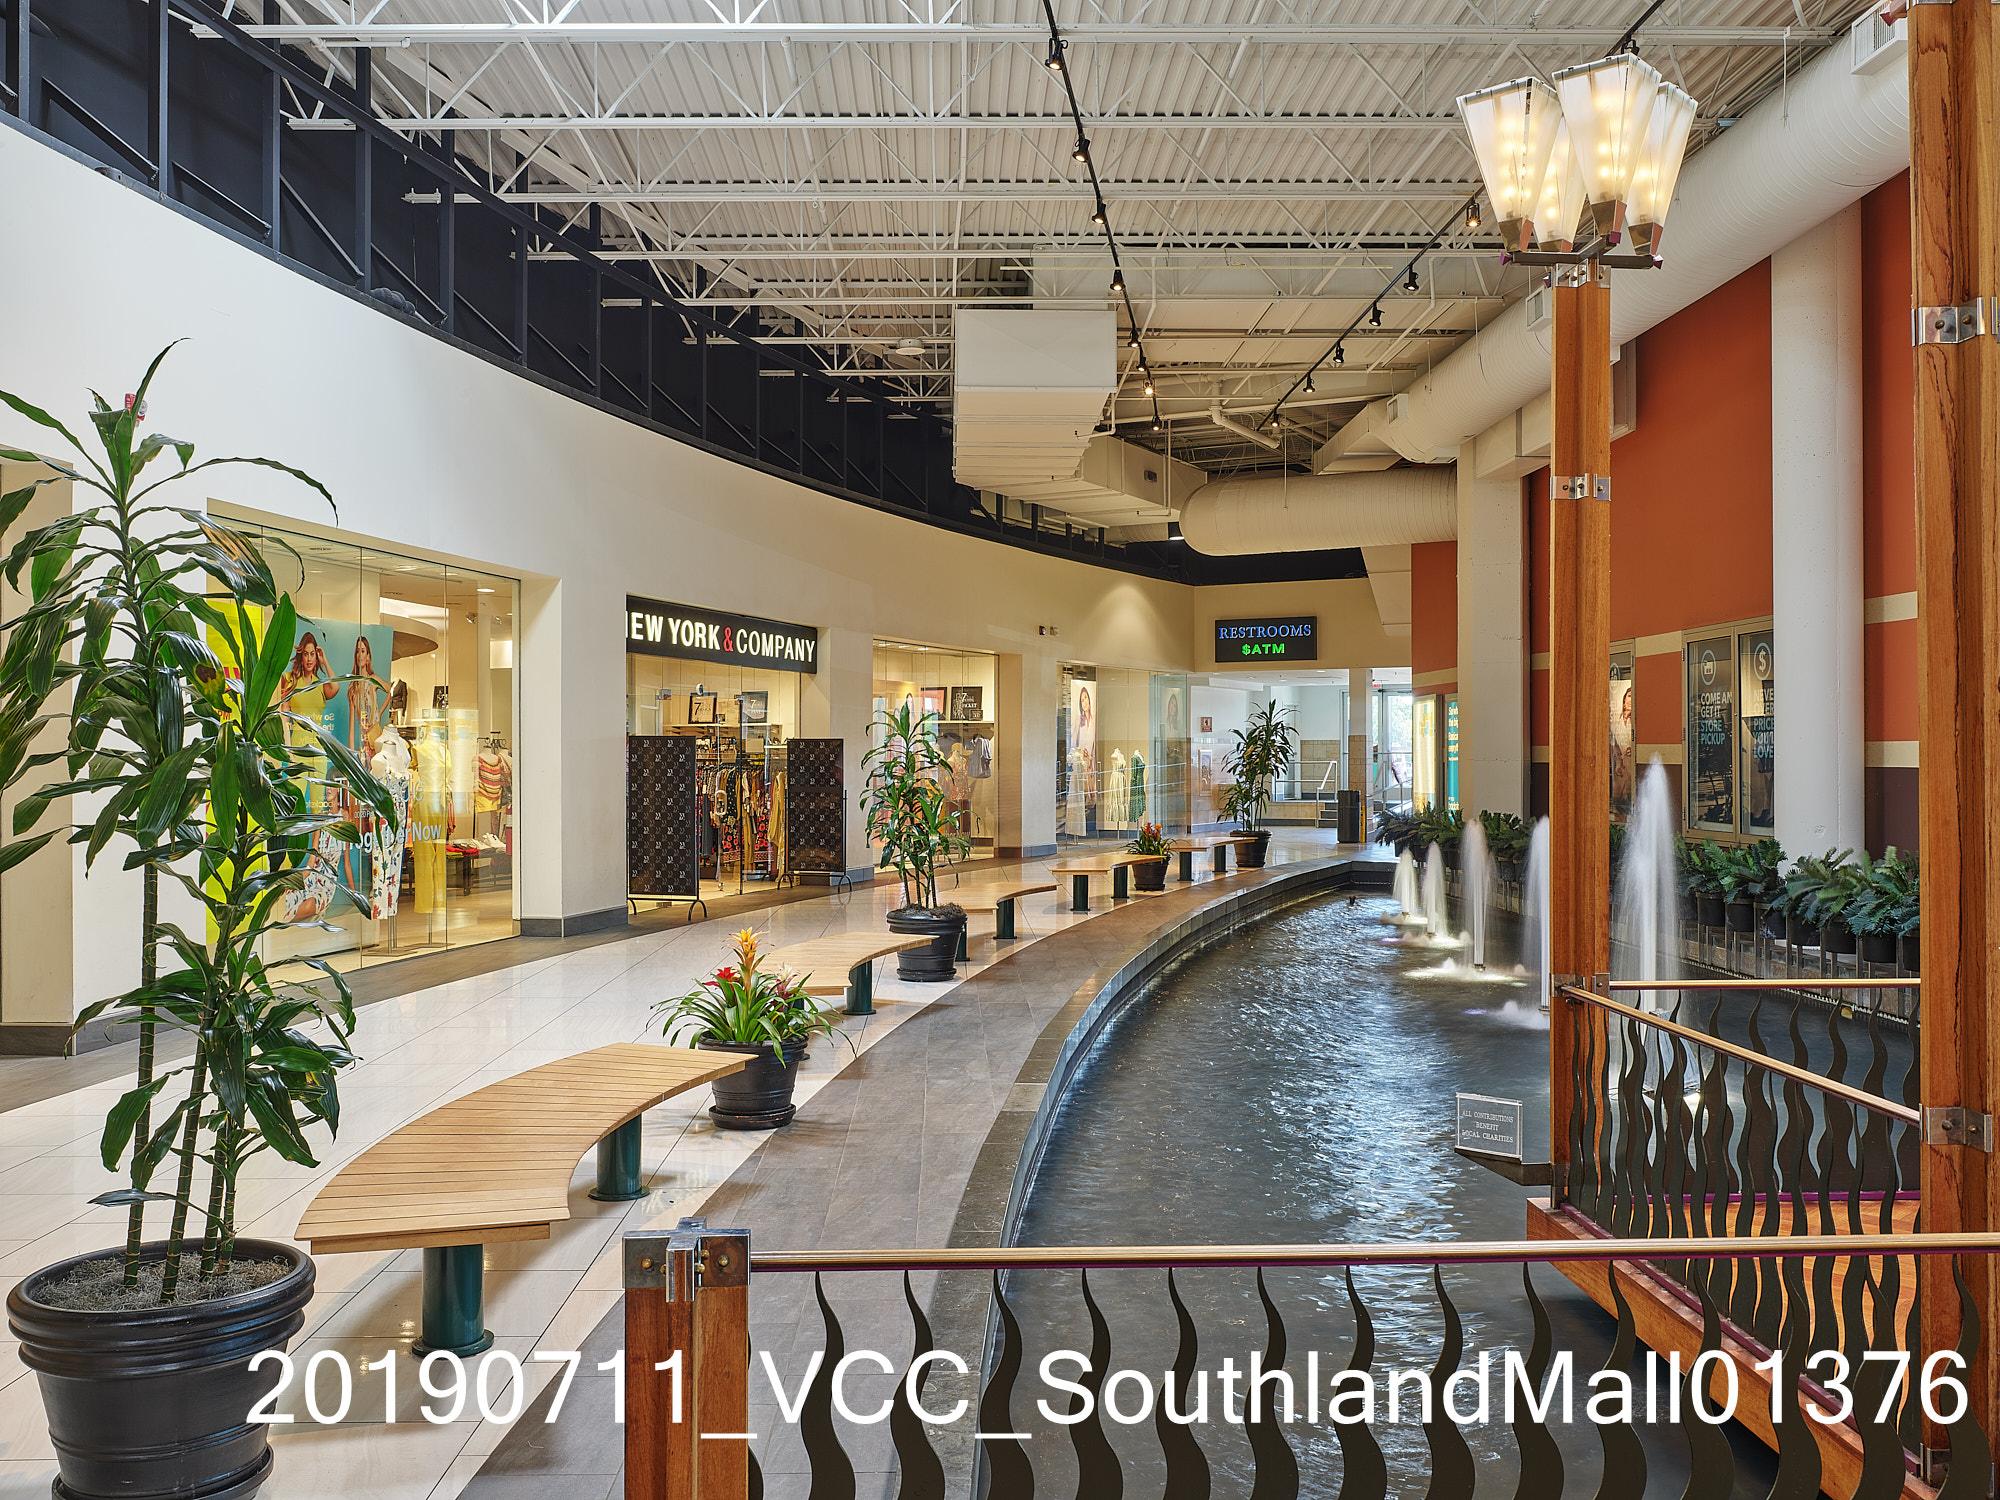 20190711_VCC_SouthlandMall01376.jpg